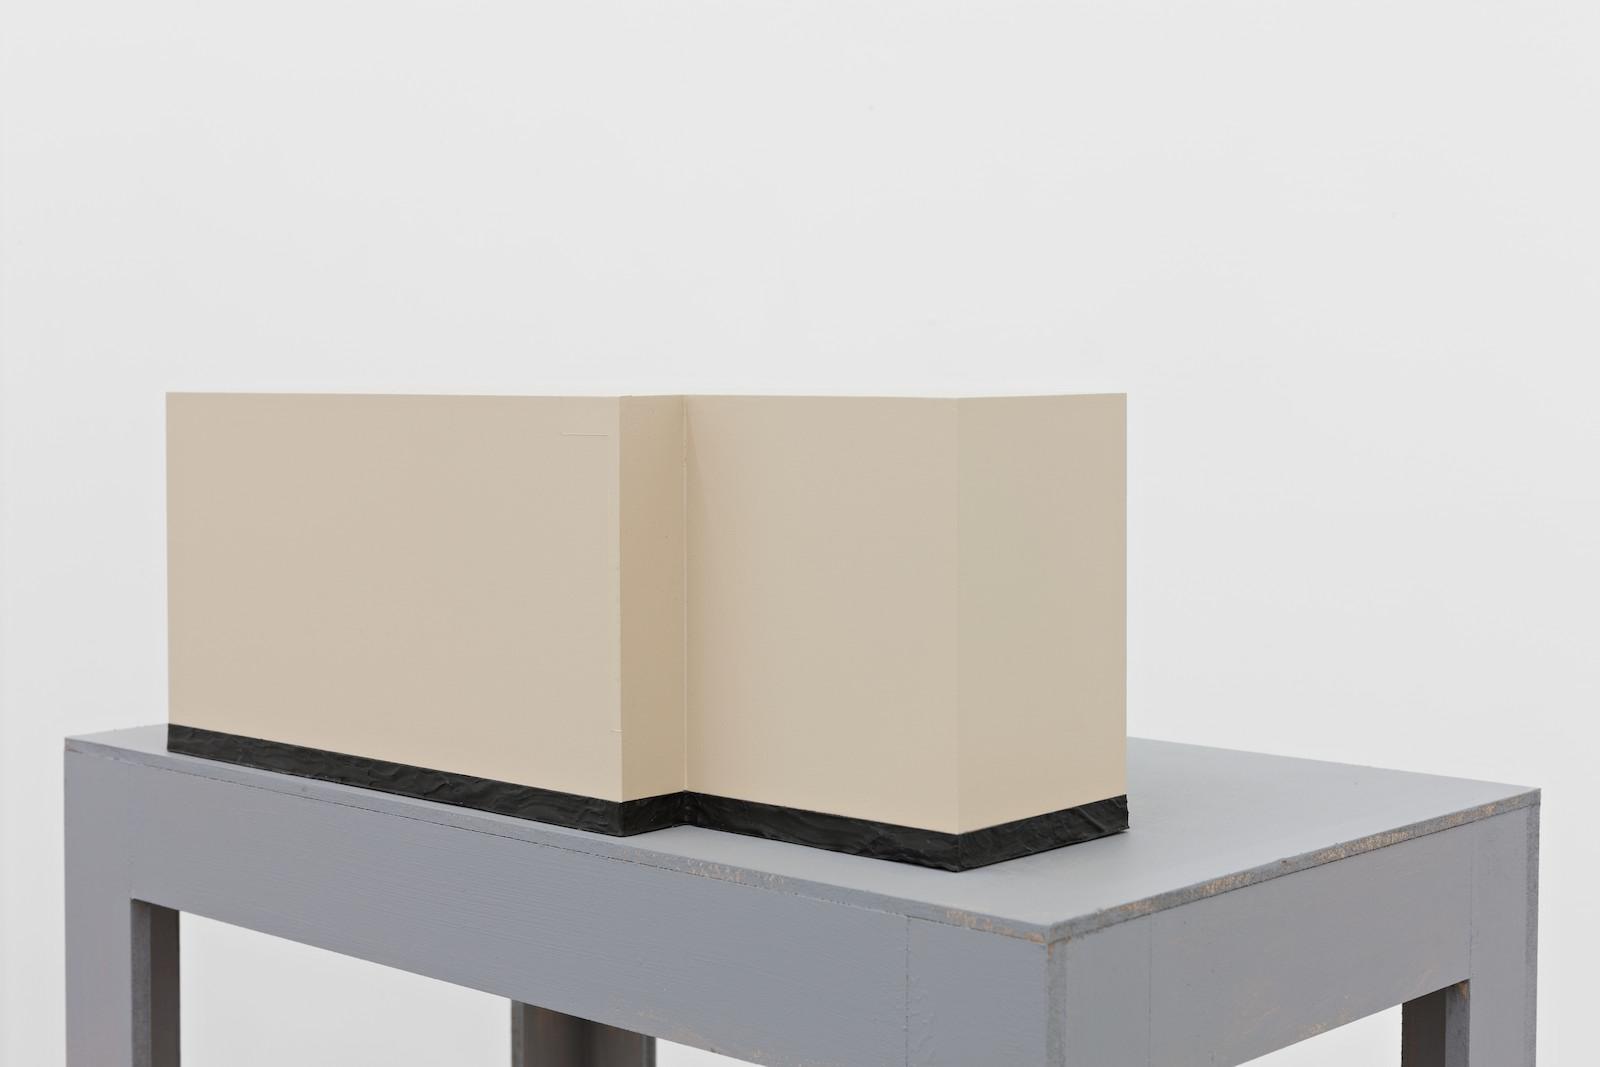 Chosement IV, 2014, acrylic on MDF, 14,8 x 38 x 11,7 cm